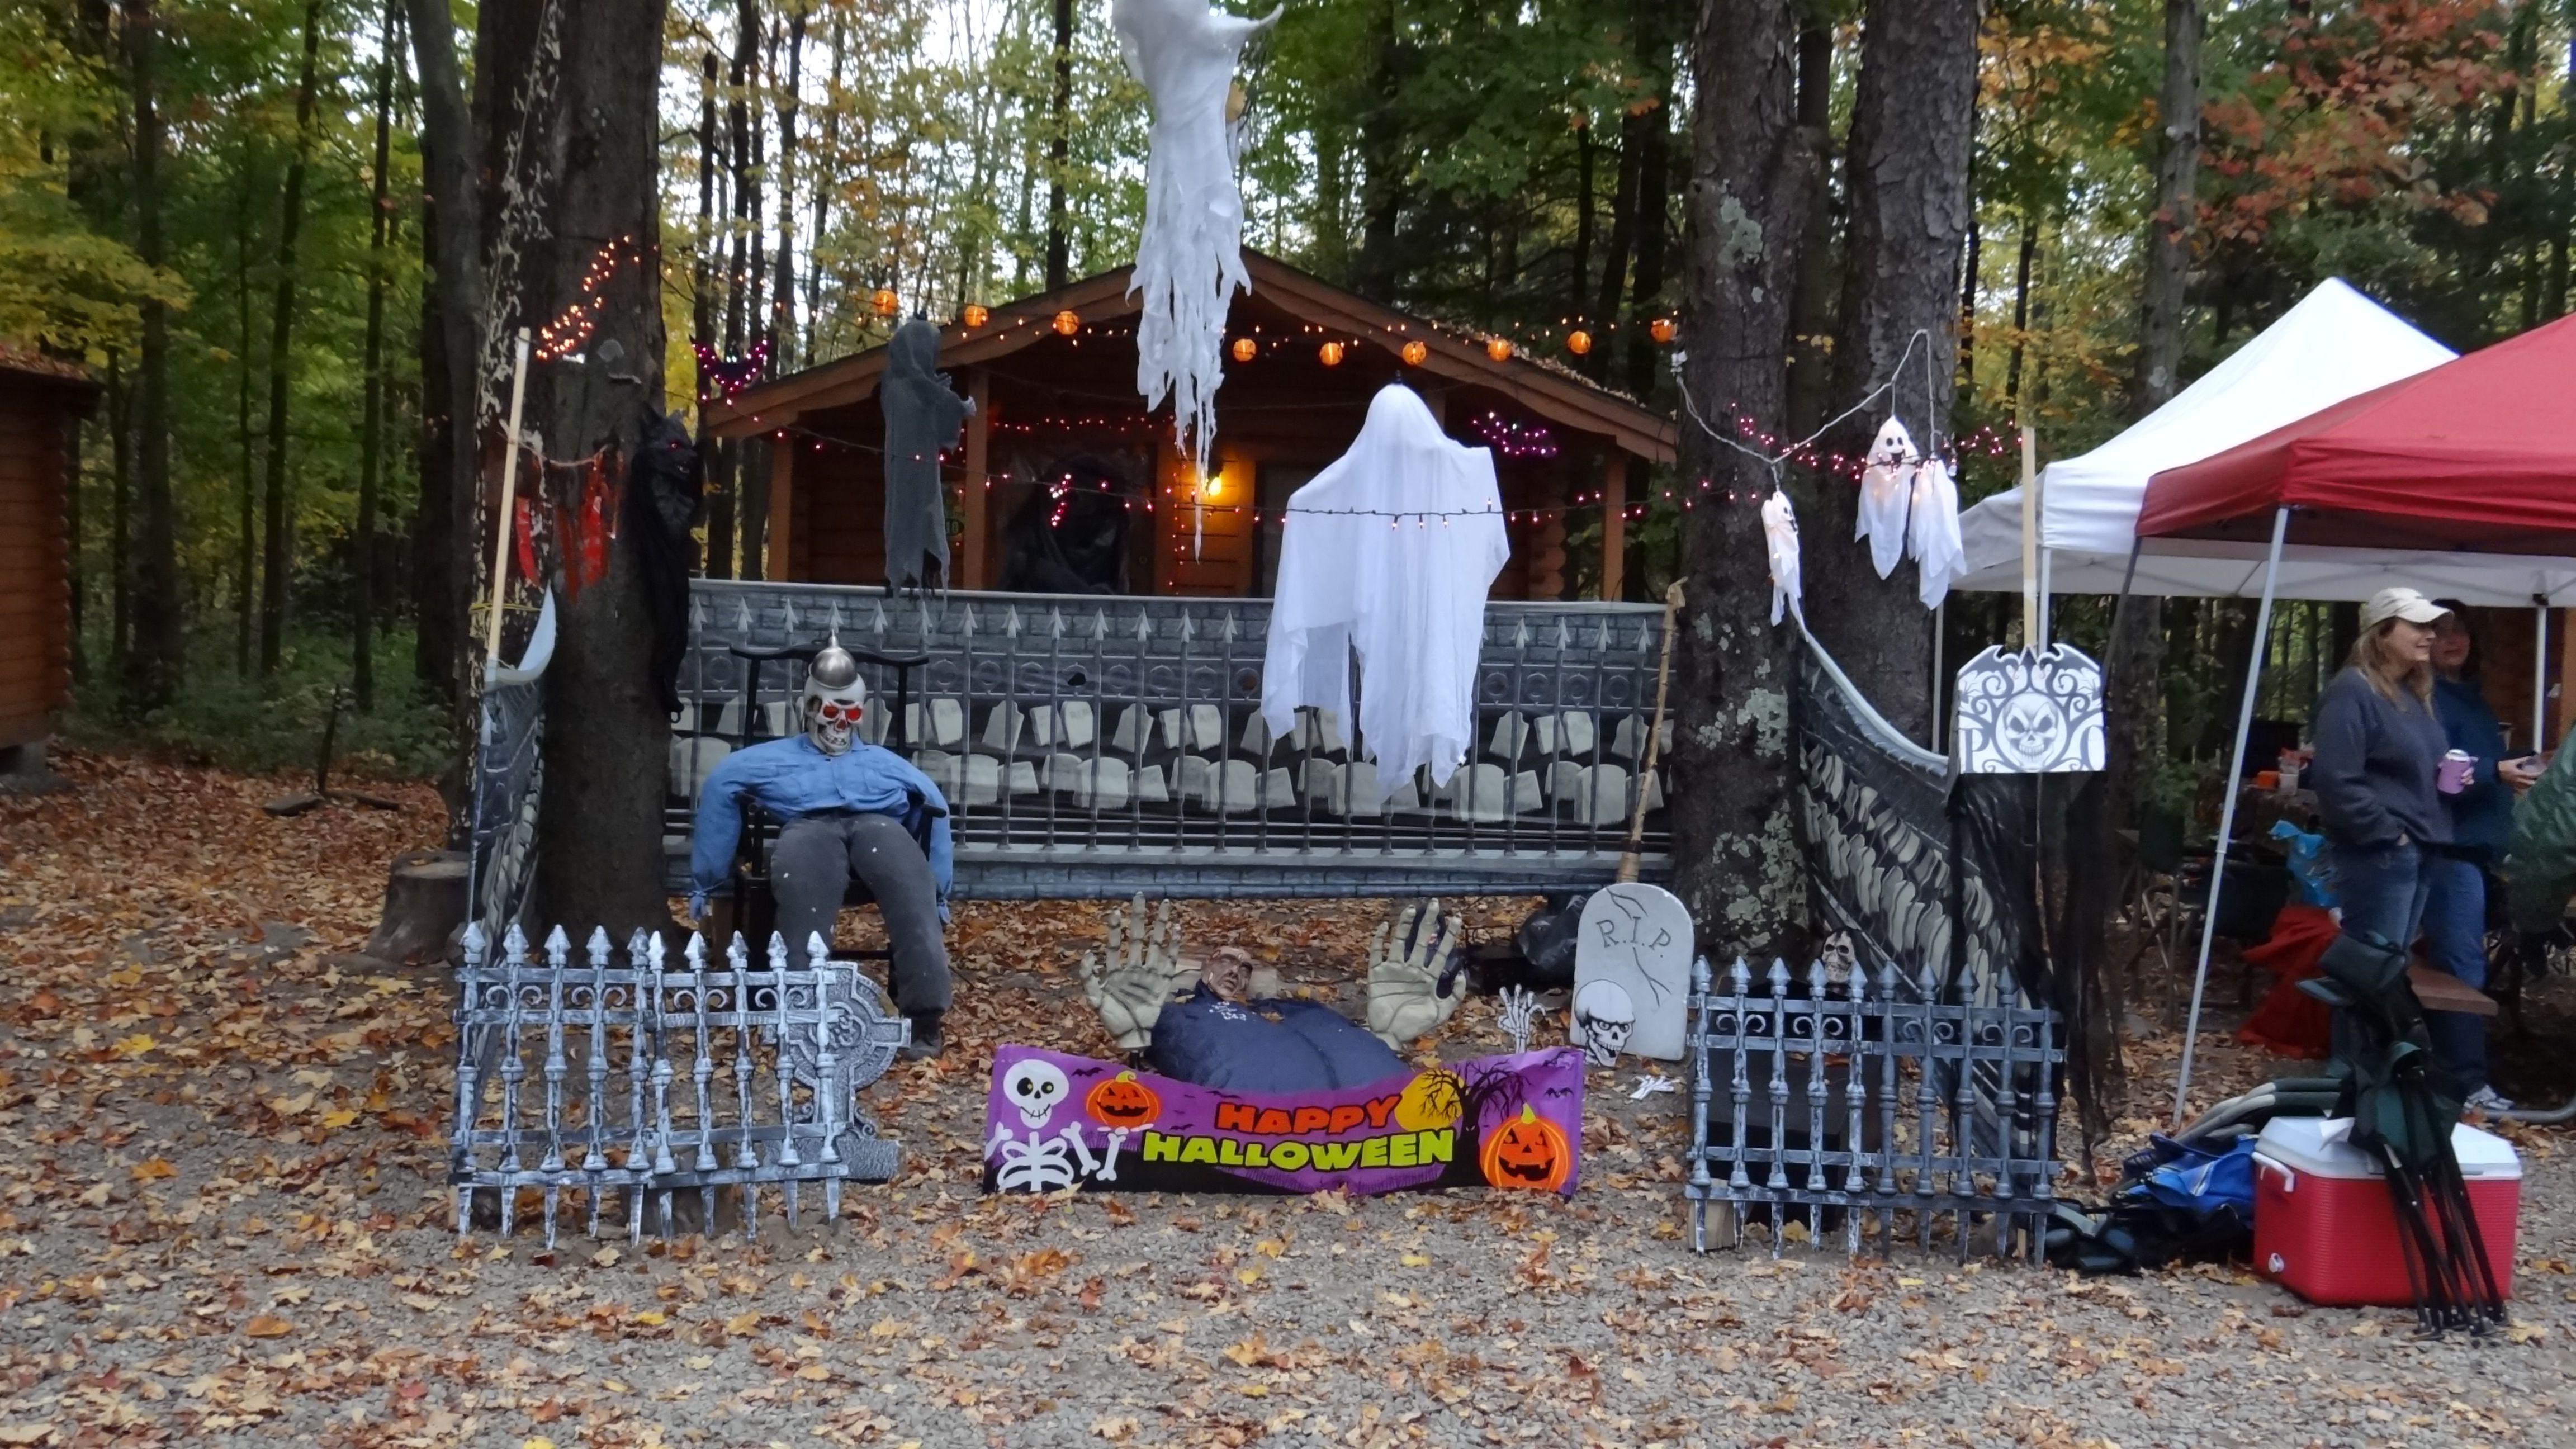 Halloween site decorating at Jellystone Park, Woodridge NY